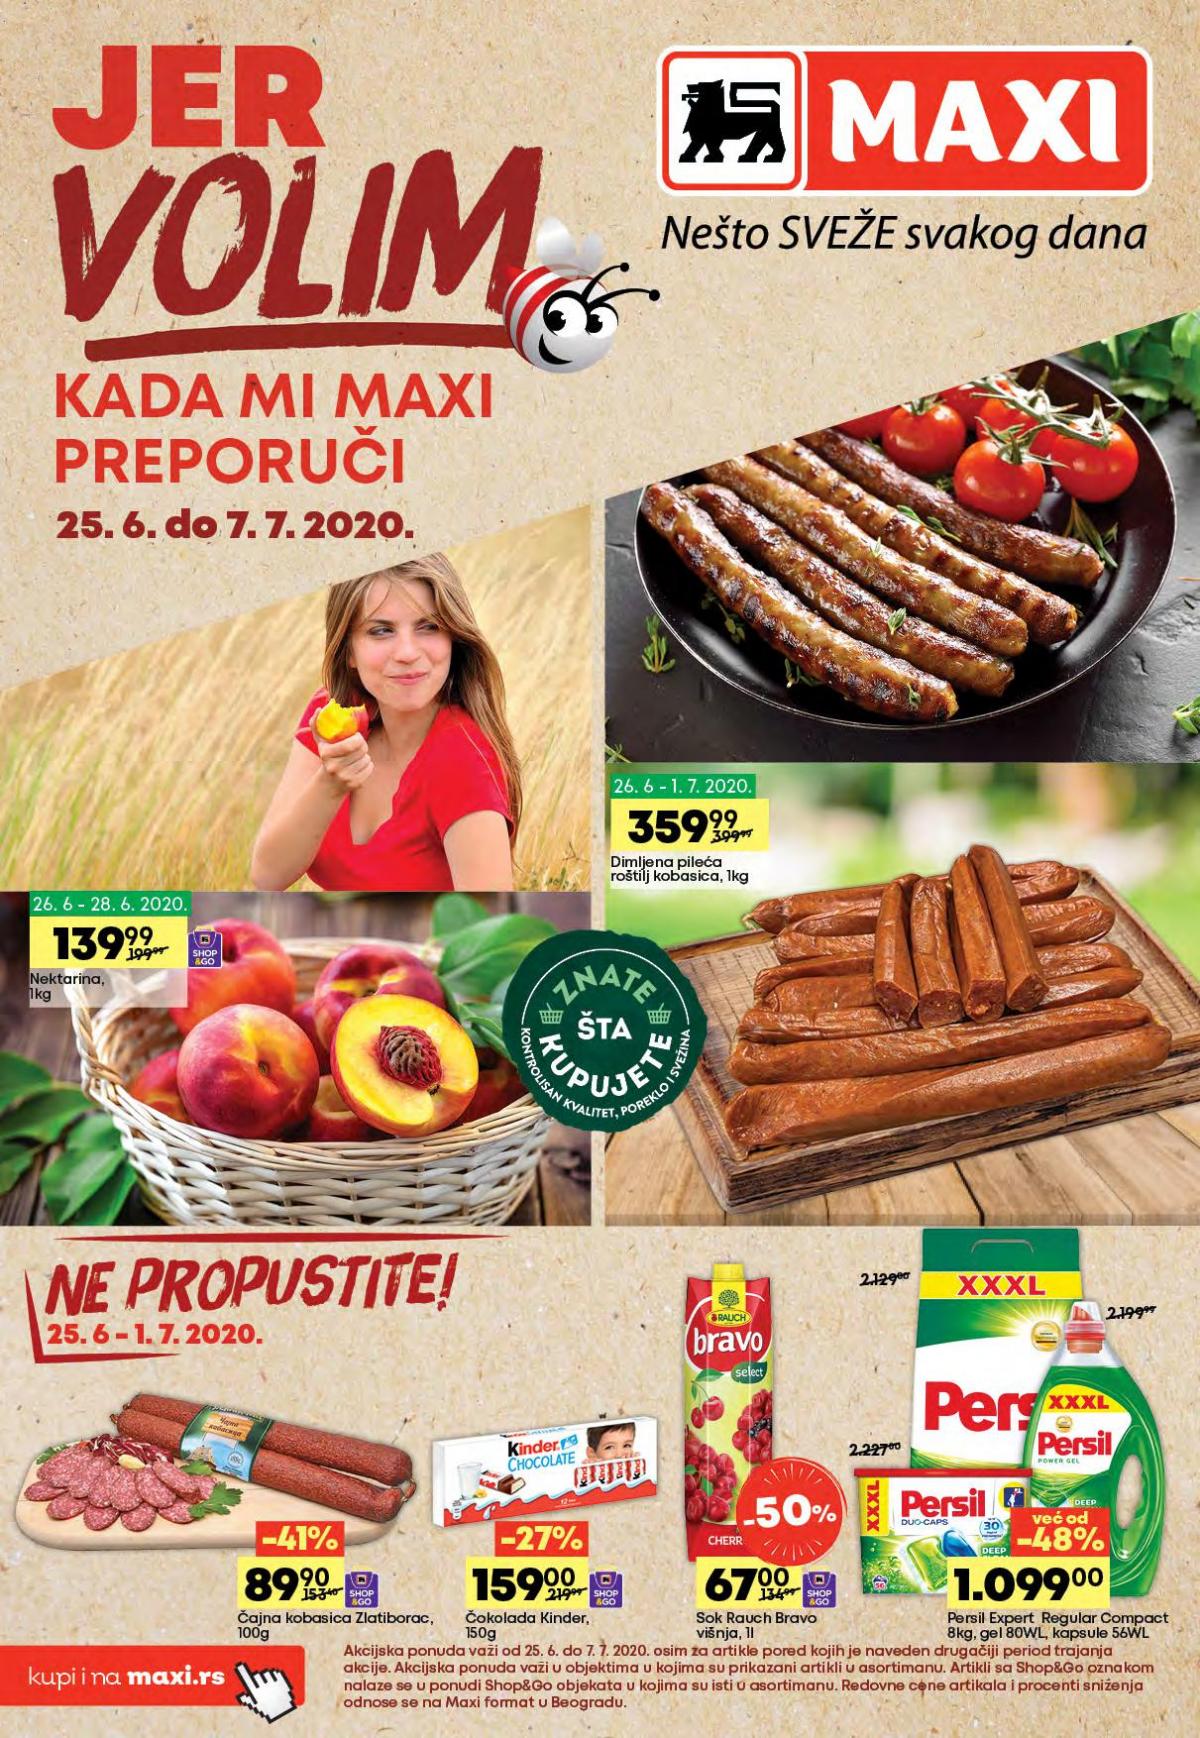 Maxi Dragice Koncar 33a Beograd Pronadite Najblize Akcije